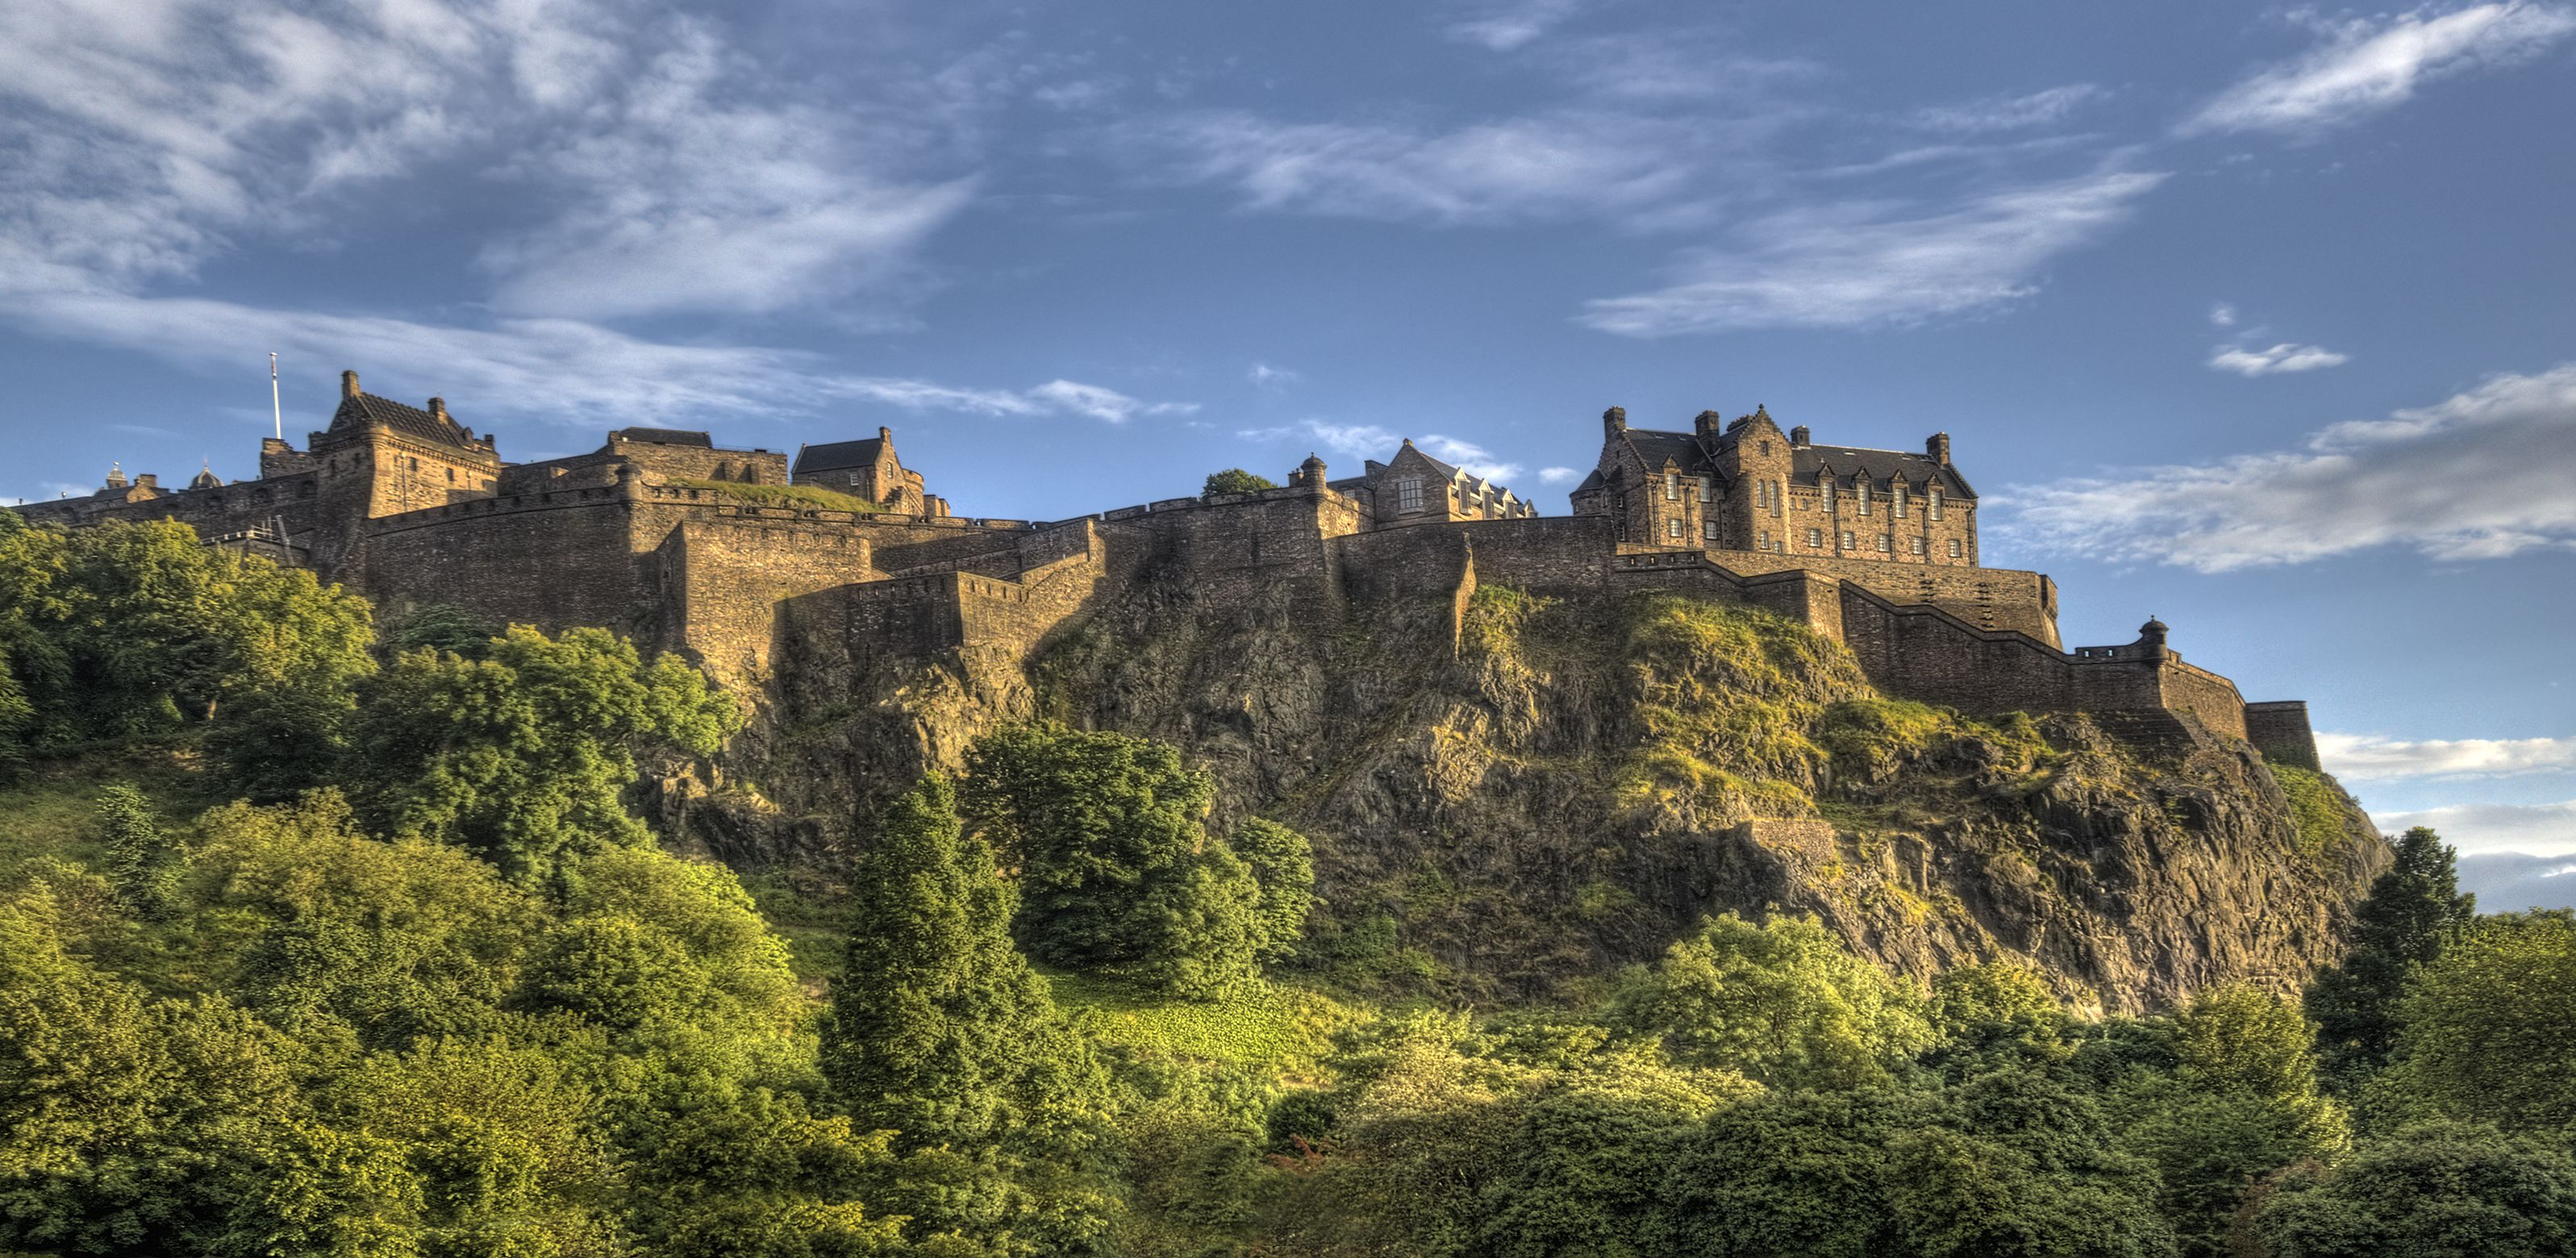 The Cliffs at Edinburgh castle